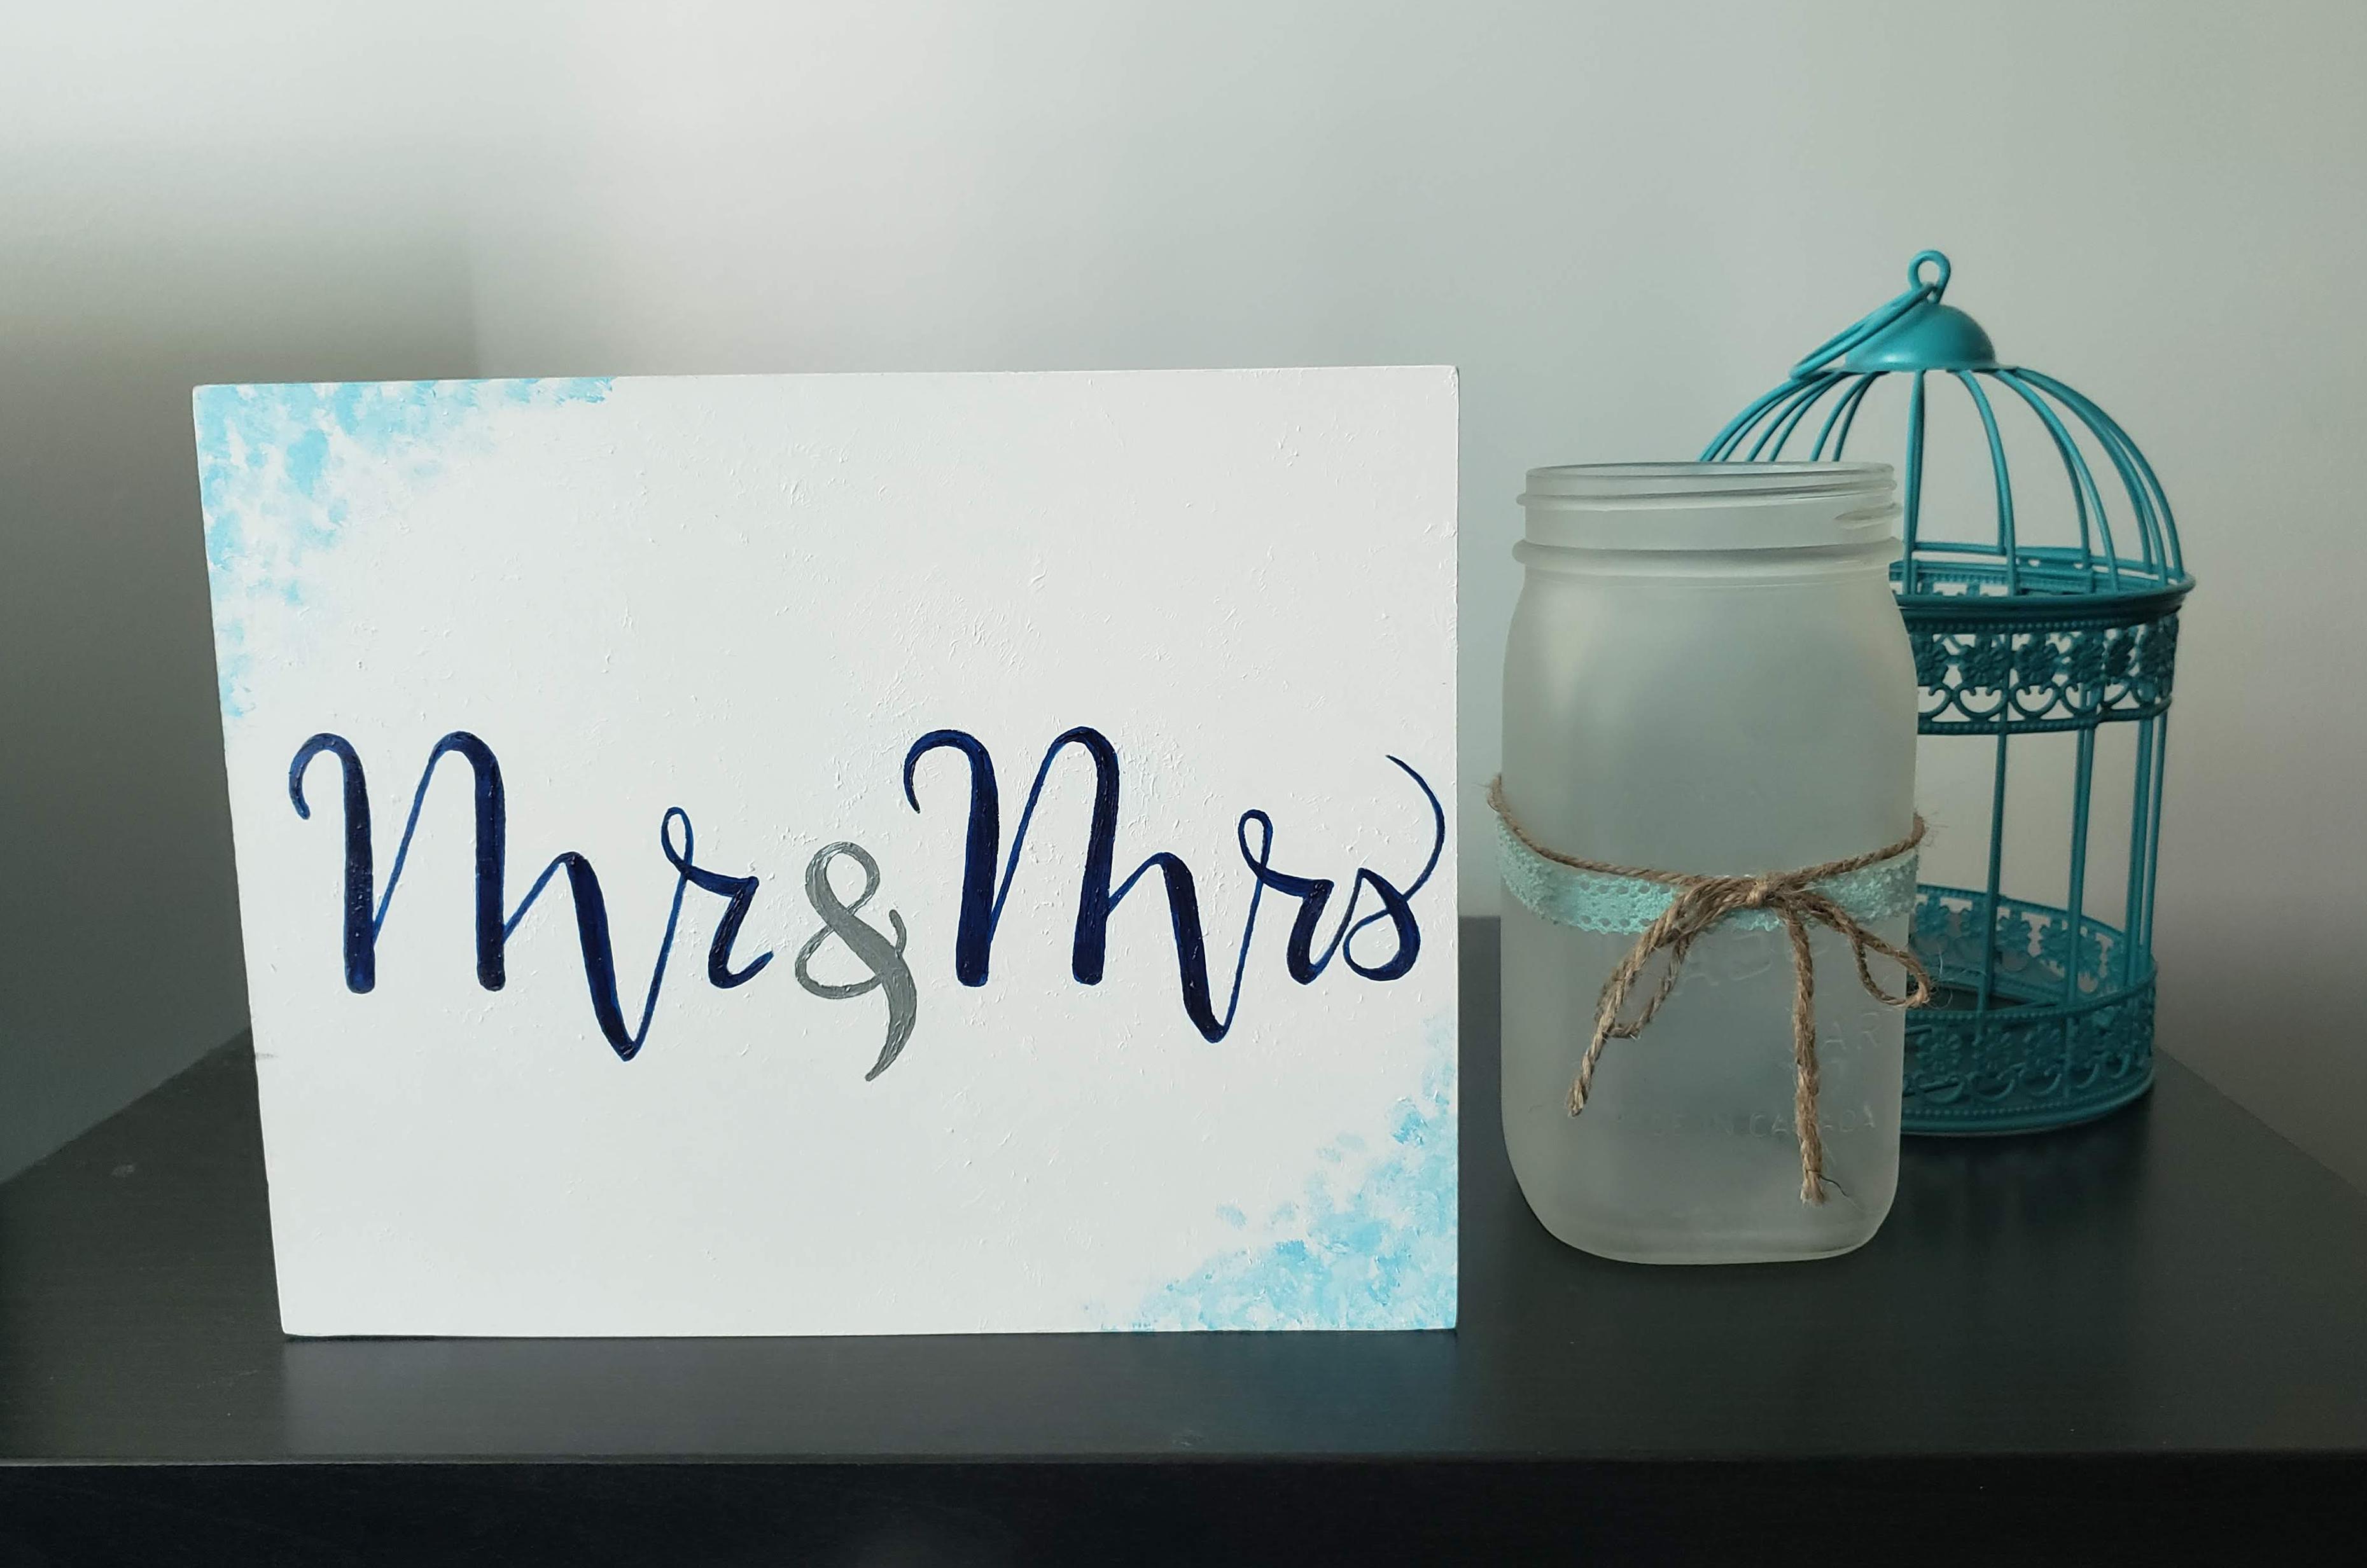 Mr & Mrs (2018)